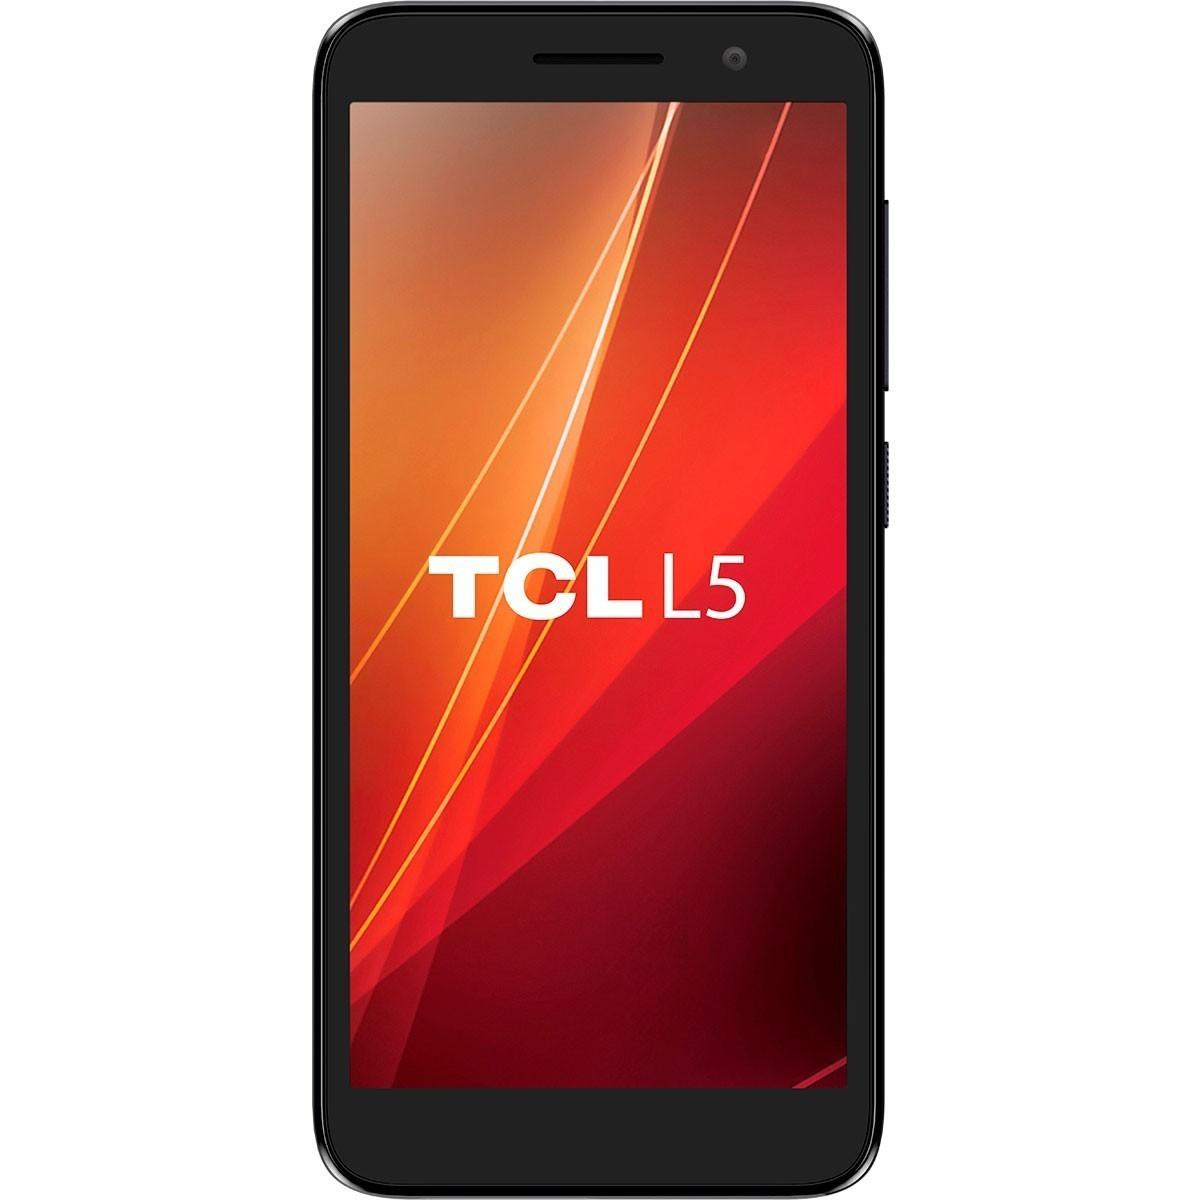 Smartphone TCL L5 Preto Dual Tela 5'' 4G 16GB 1GB Ram Quad-Core 8MP+5MP + Capa Protetora